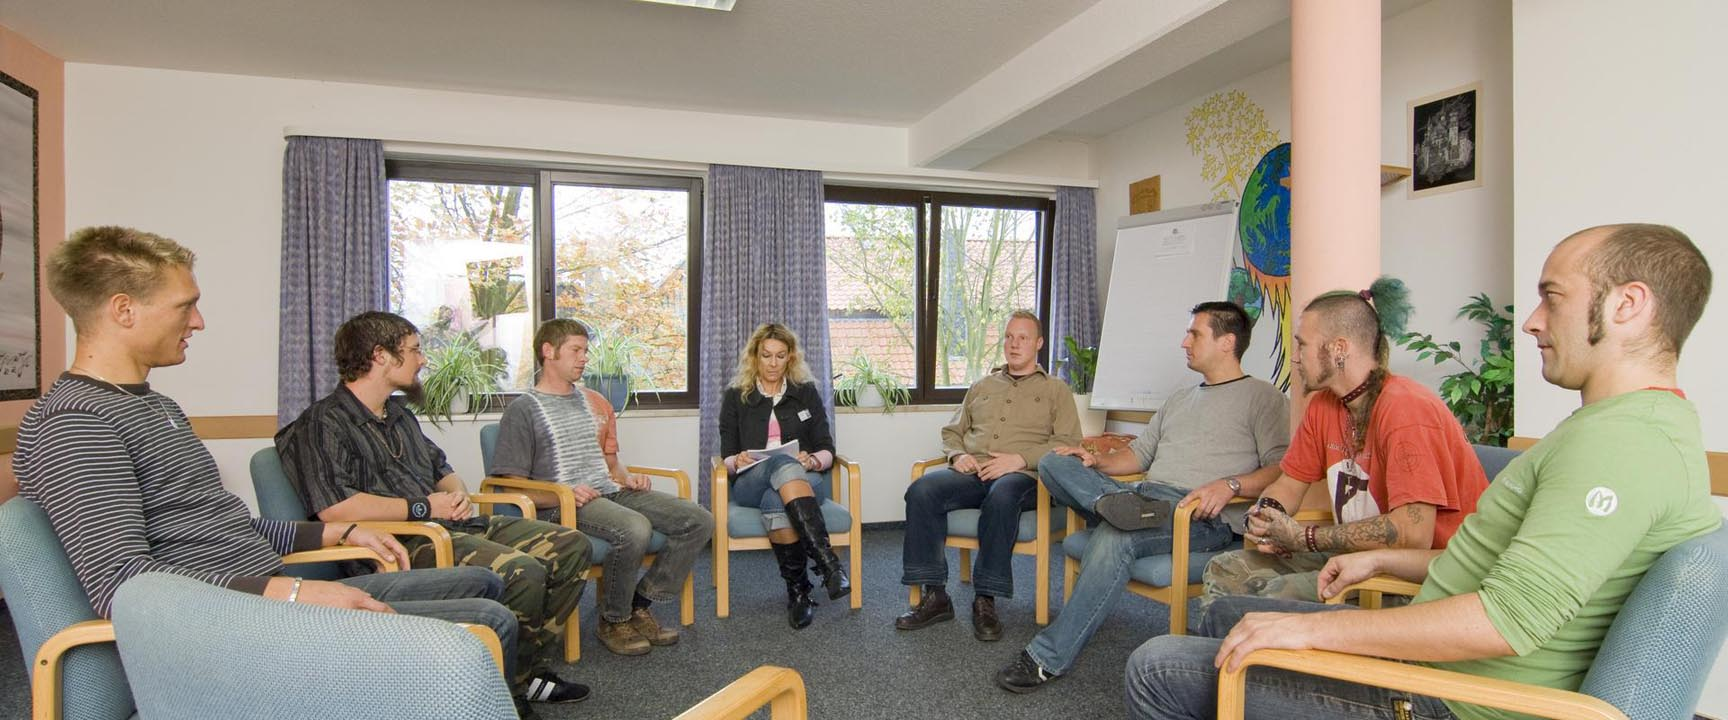 MEDIAN Klinik Richelsdorf Patienten bei Gruppentherapie